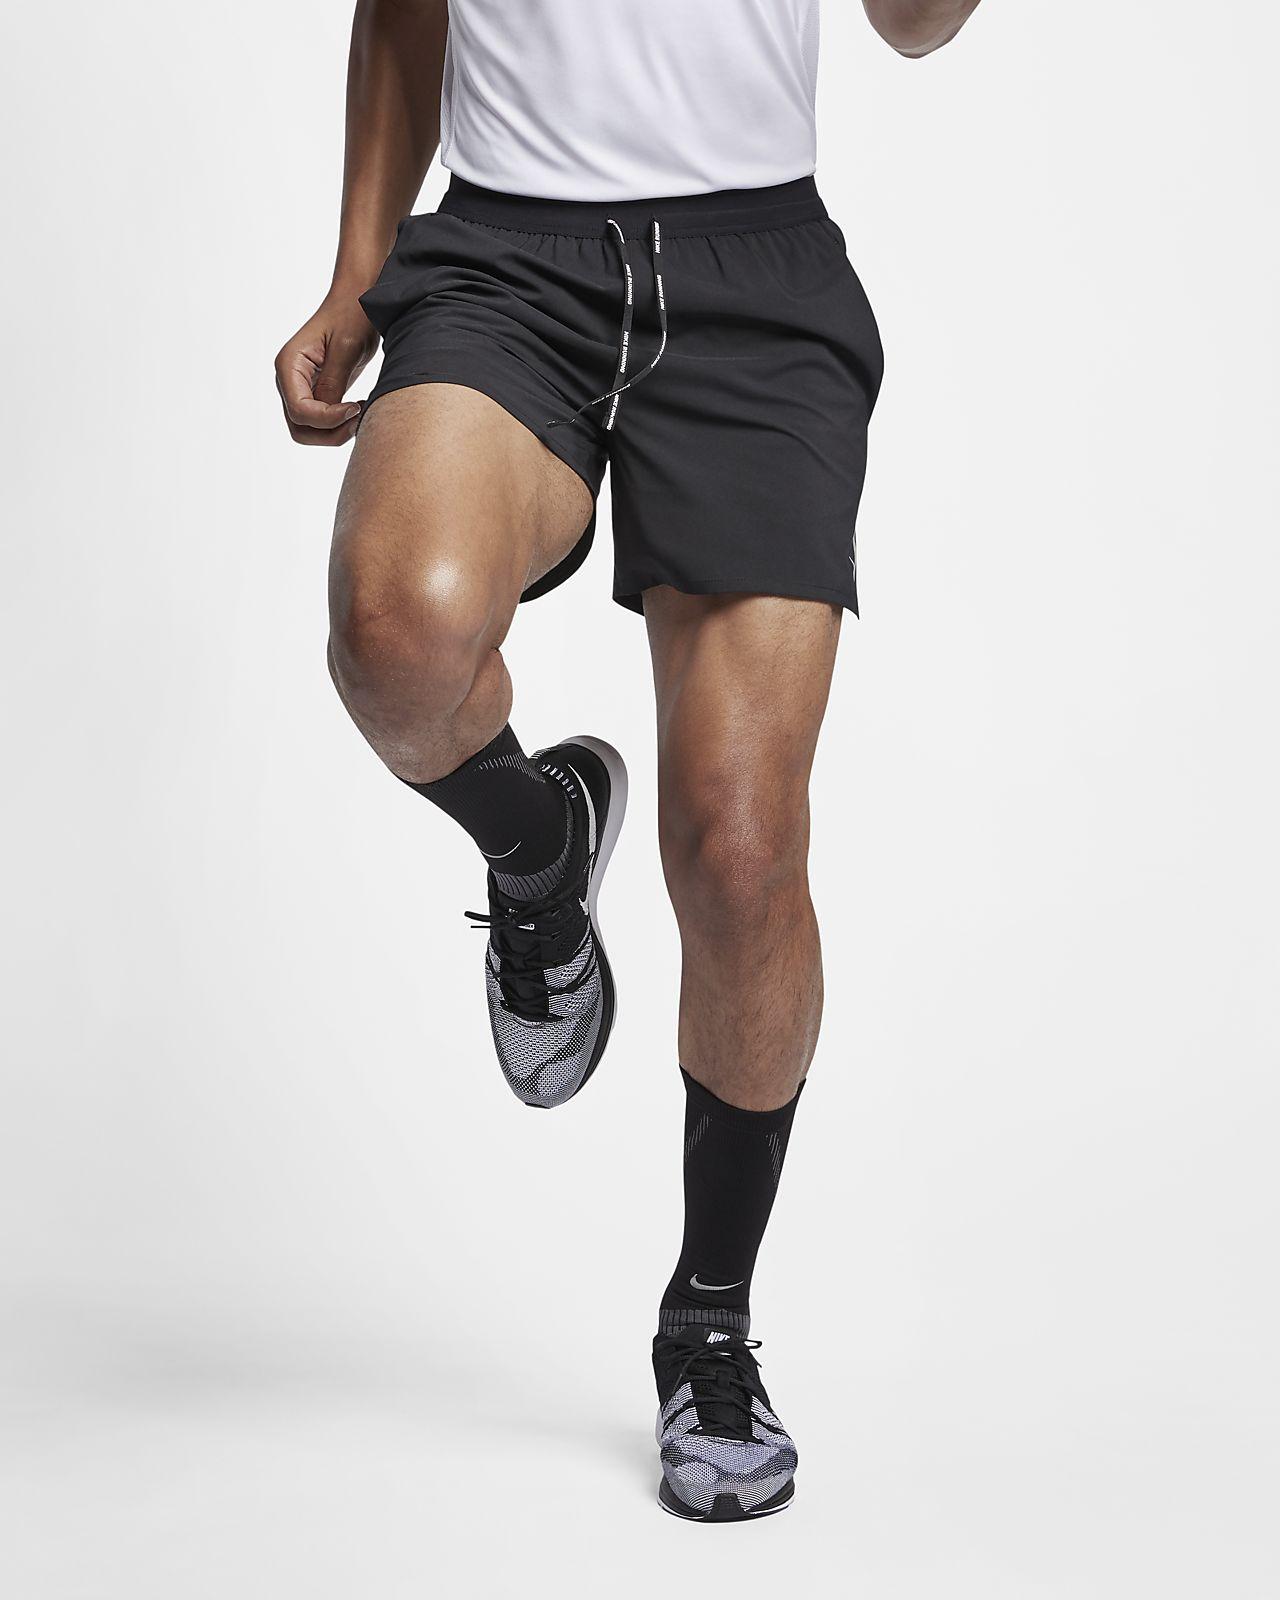 cdaa2c7c100a Nike Flex Stride Men s 5